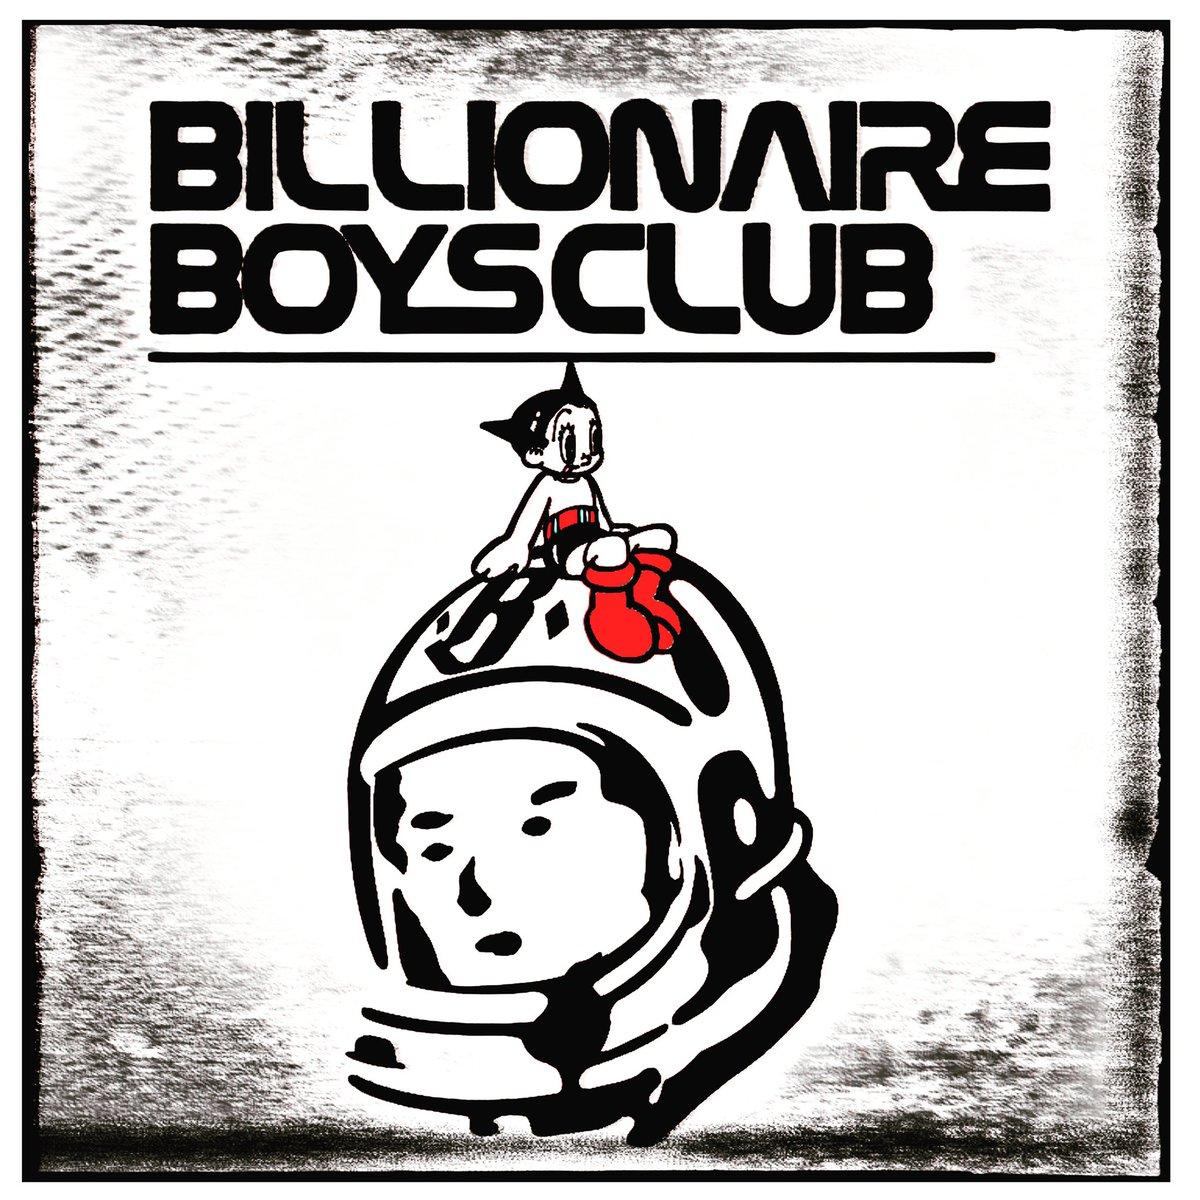 #Billionaire #BoysClub #Fashion #Art